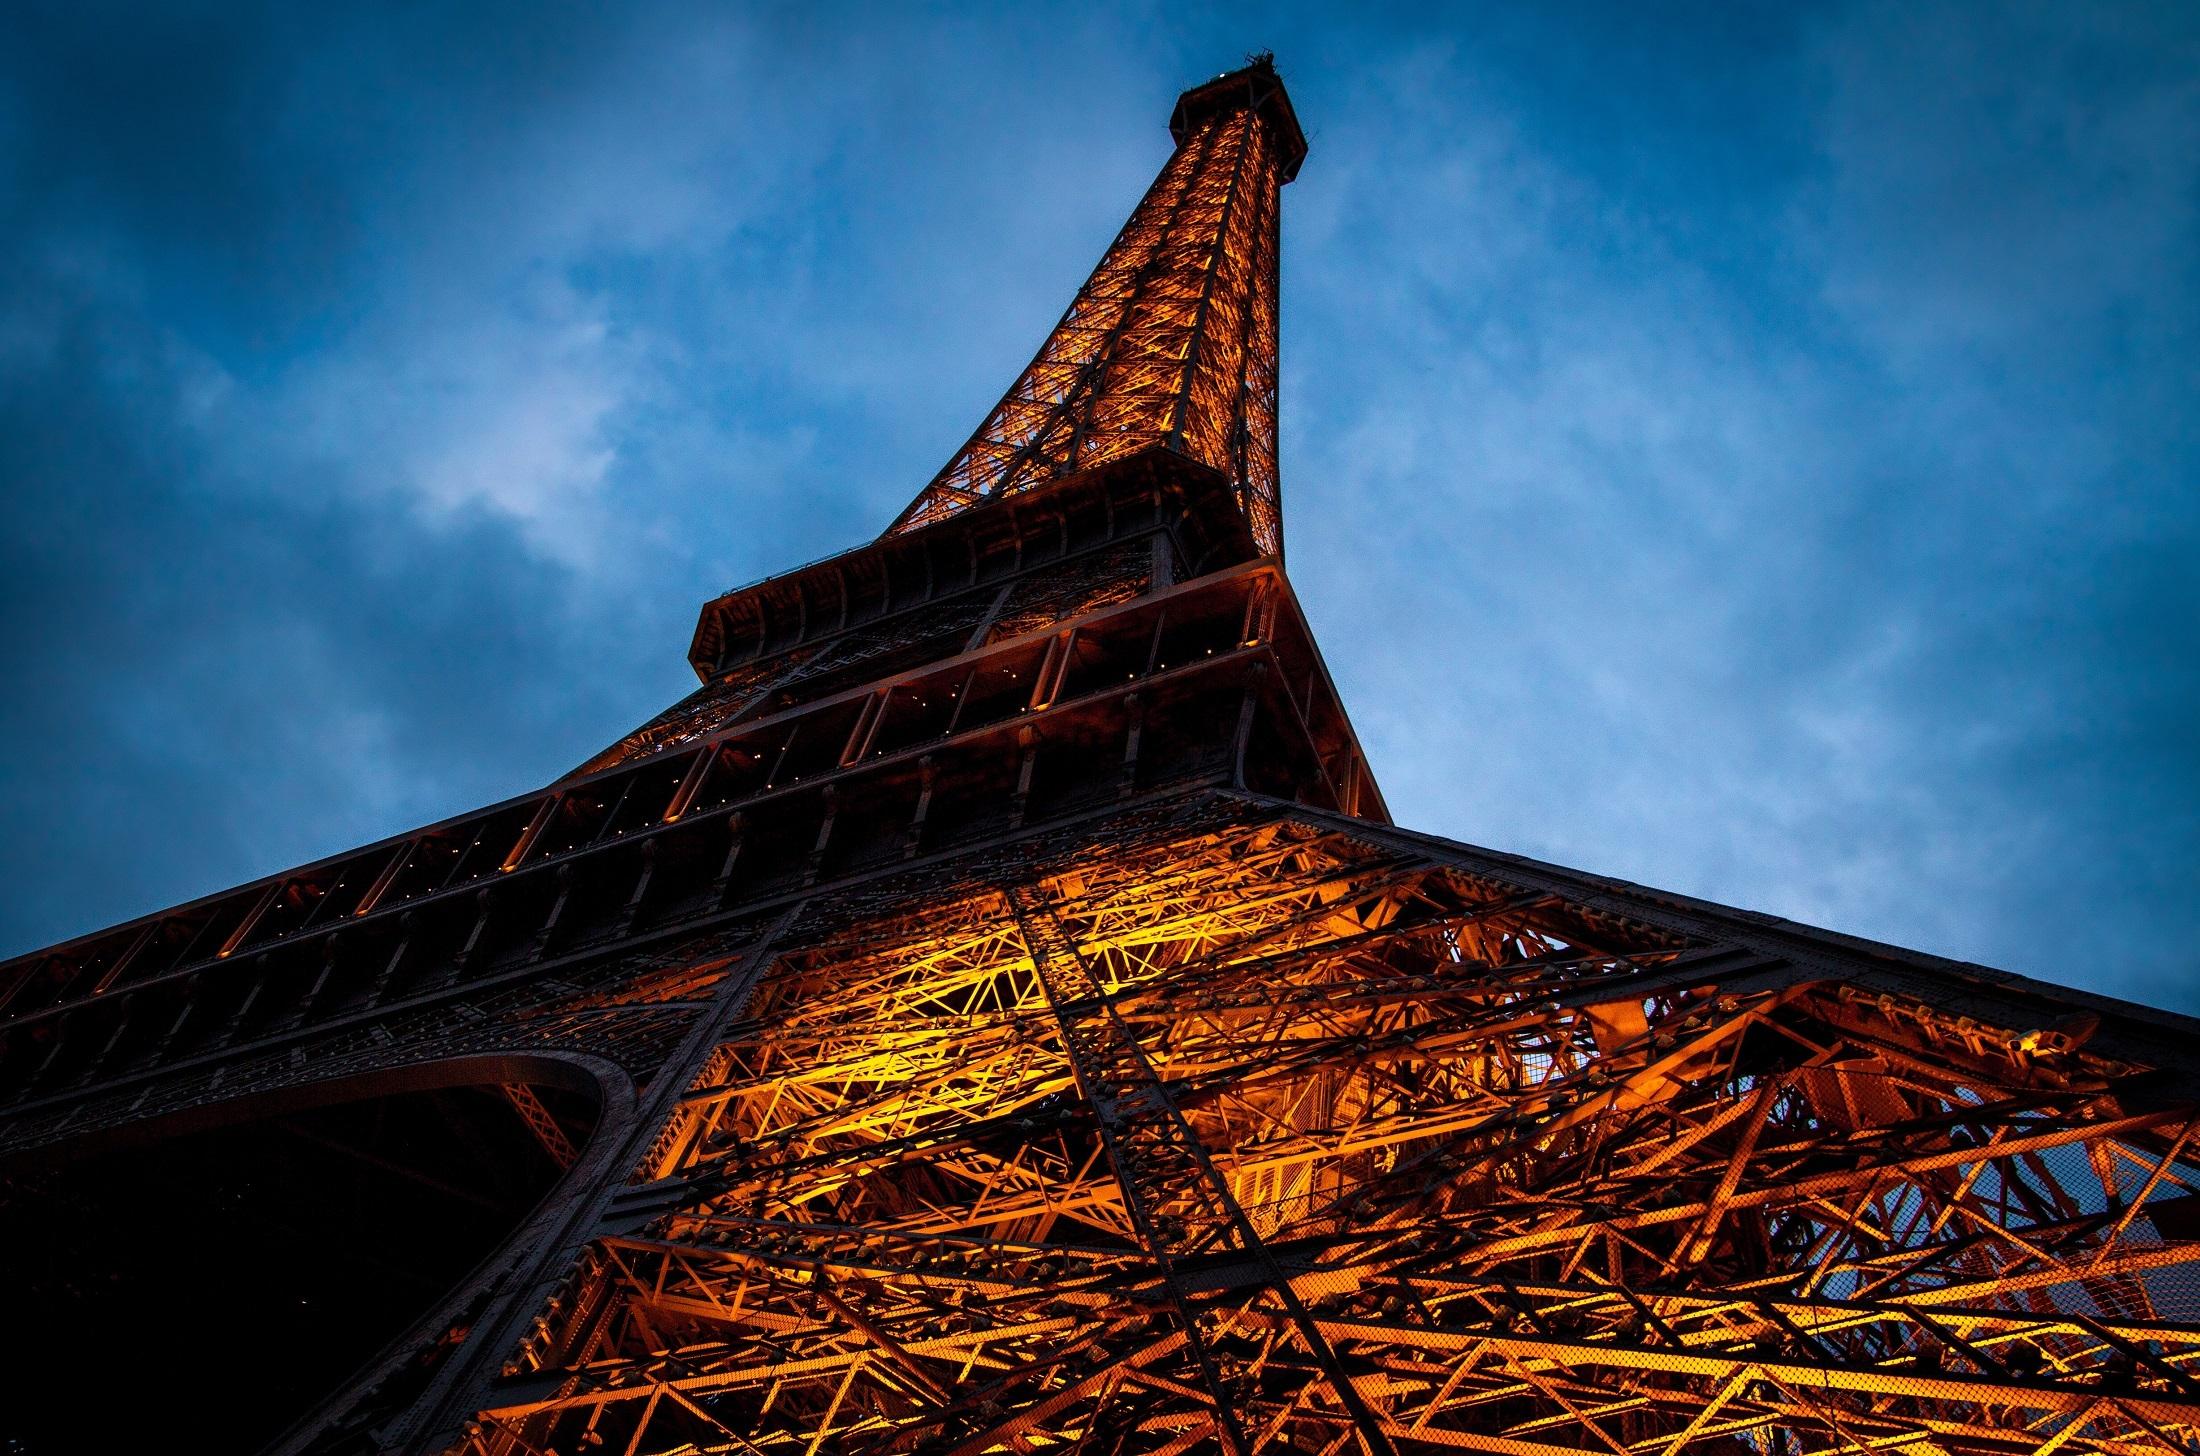 eiffel-tower-paris-monument-symbol-161829